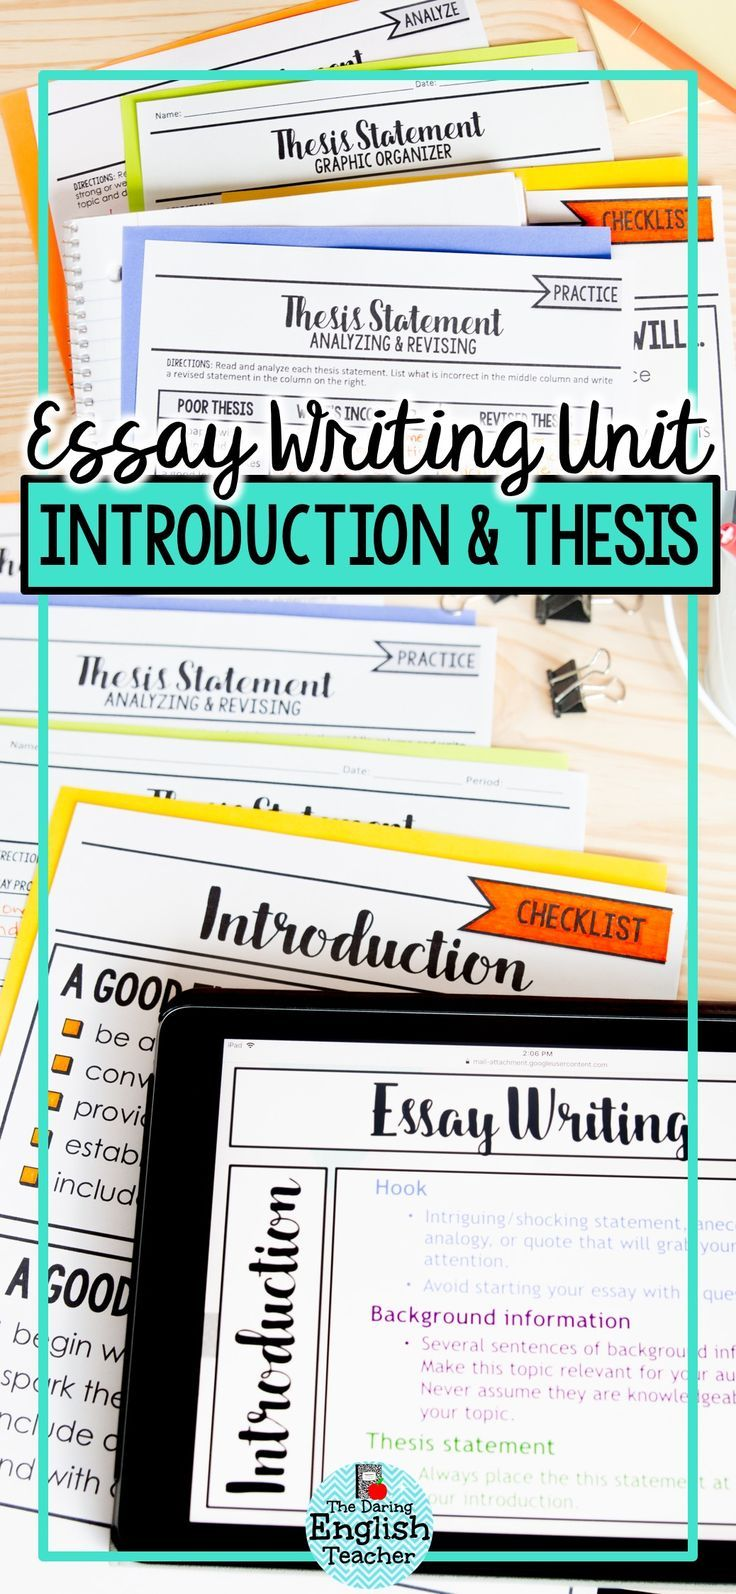 Best argumentative essay ghostwriting services for school